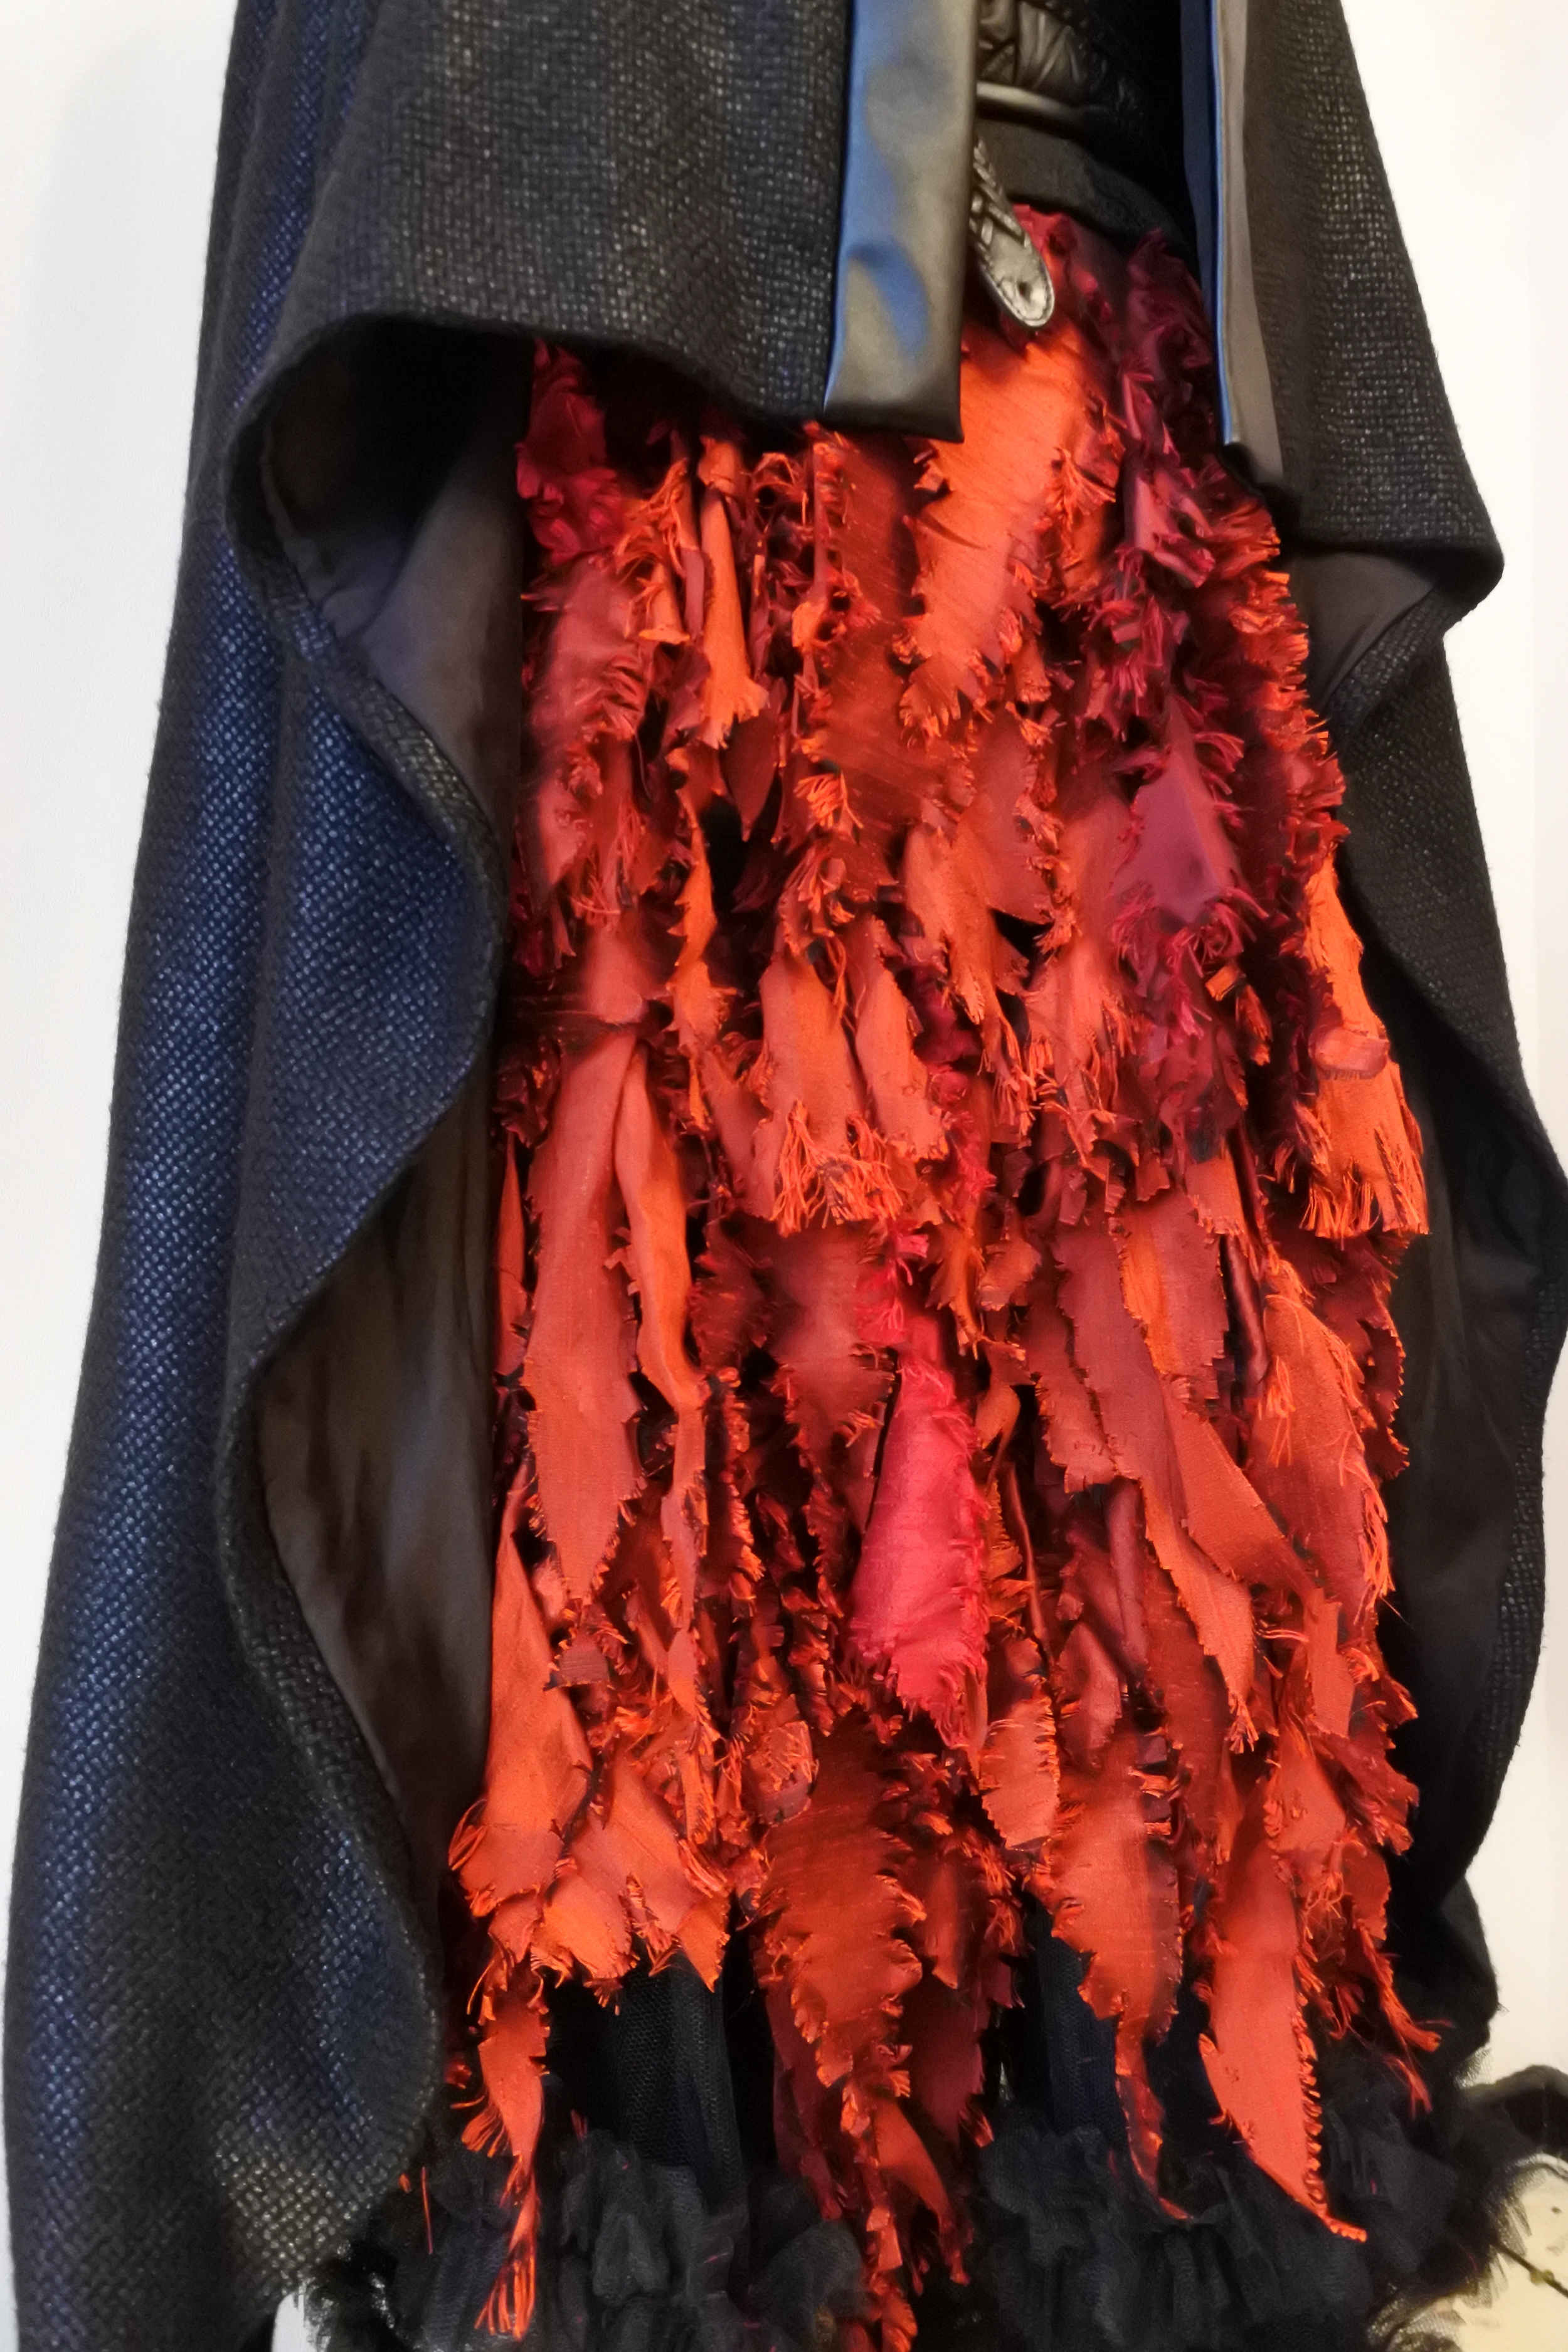 Shredded silk taffeta skirt